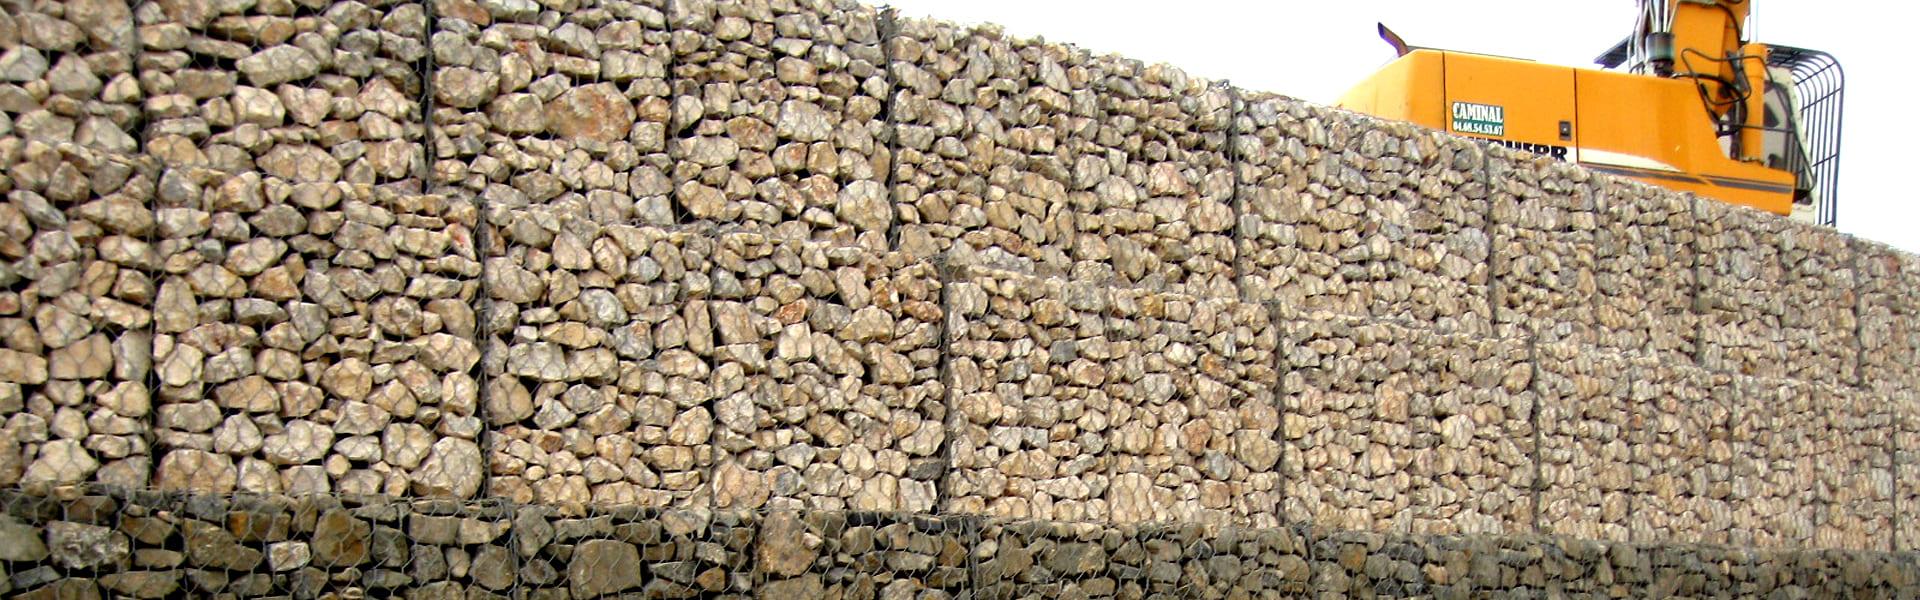 enrochement-caminal-creation-mur-gabions-perpignan